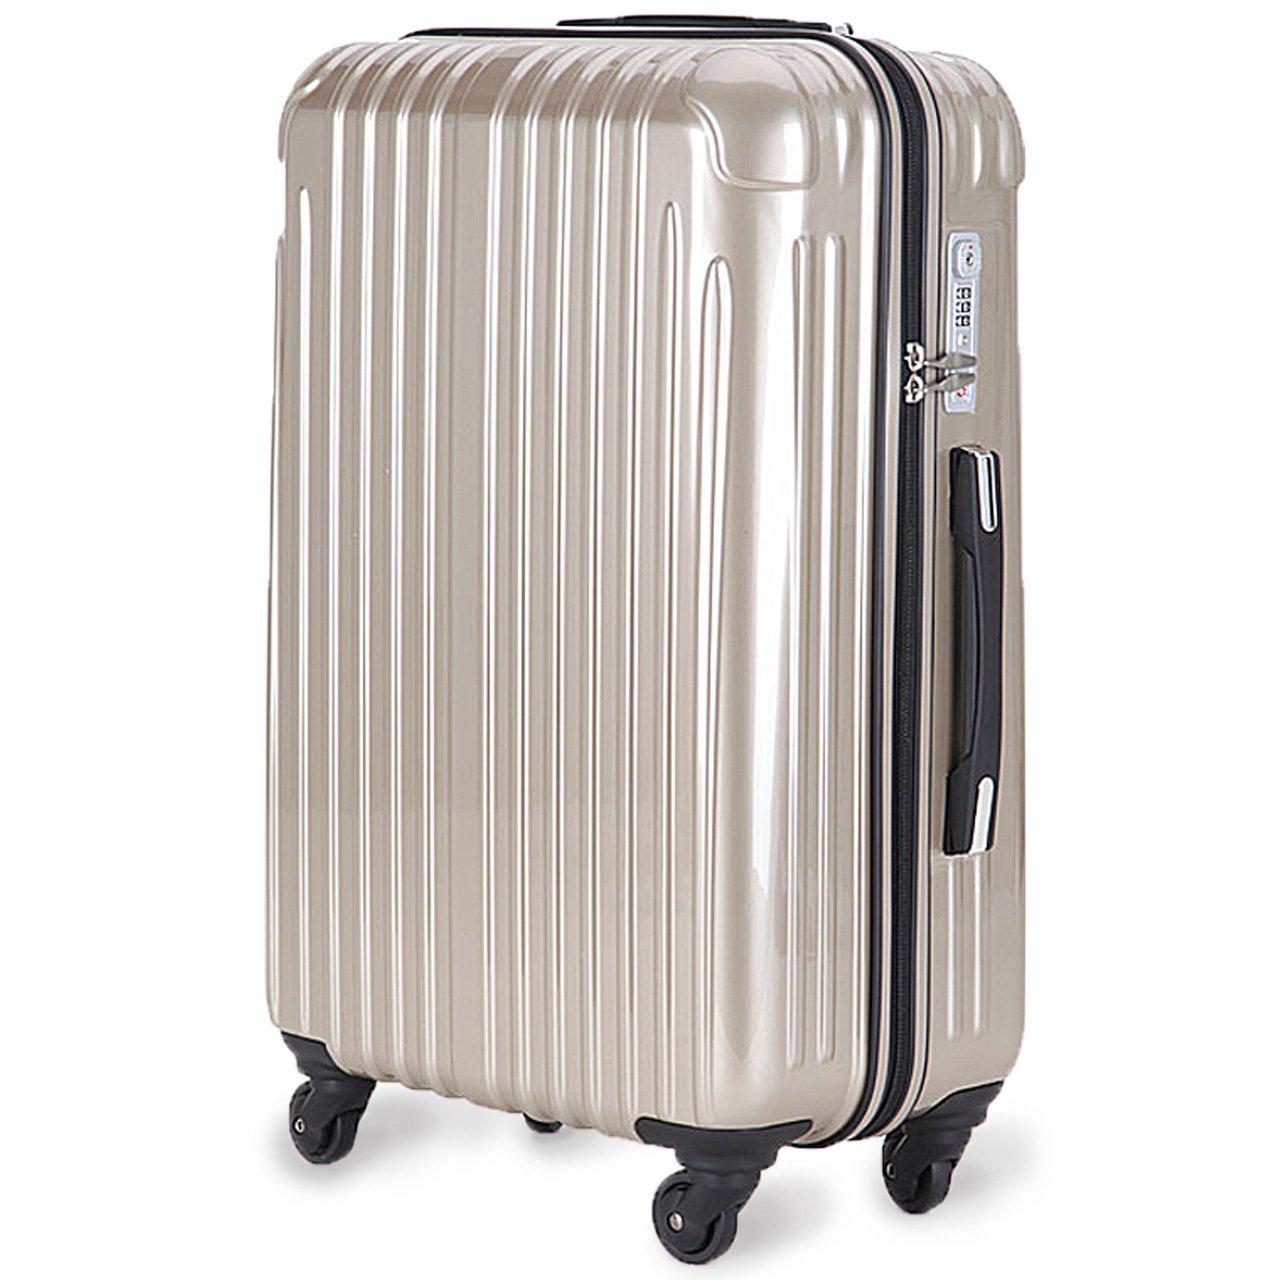 strike[ストライク]超軽量 2年保証 スーツケース TSAロック搭載 旅行バック トランクケース 旅行カバン B071NLMX5H 大型Lサイズ(長期滞在)|シャンパンゴールド シャンパンゴールド 大型Lサイズ(長期滞在)